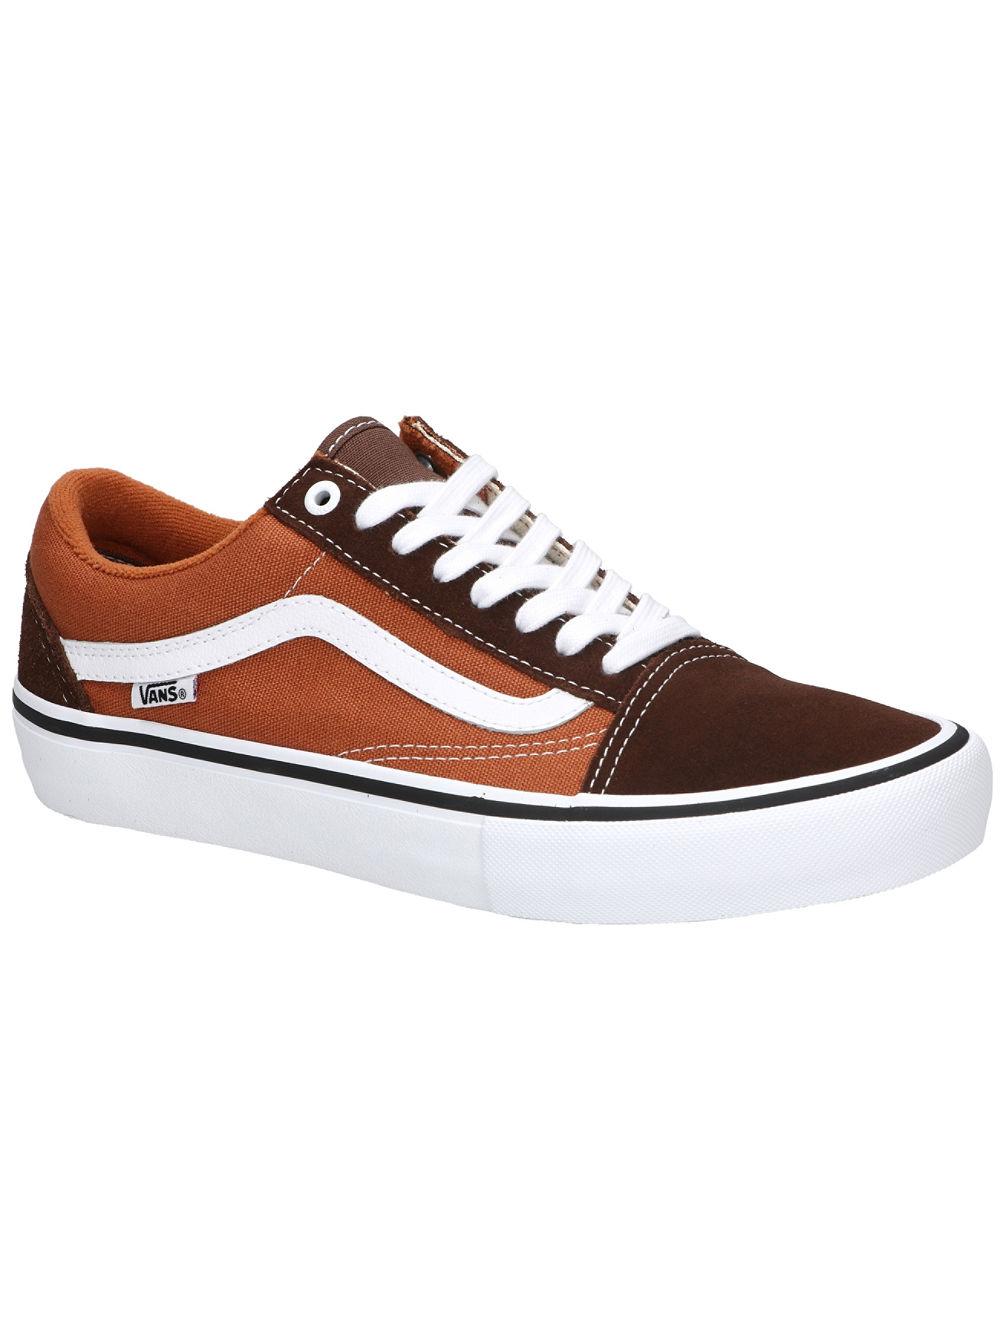 0ded2229e220 Buy Vans Old Skool Pro Skate Shoes online at Blue Tomato